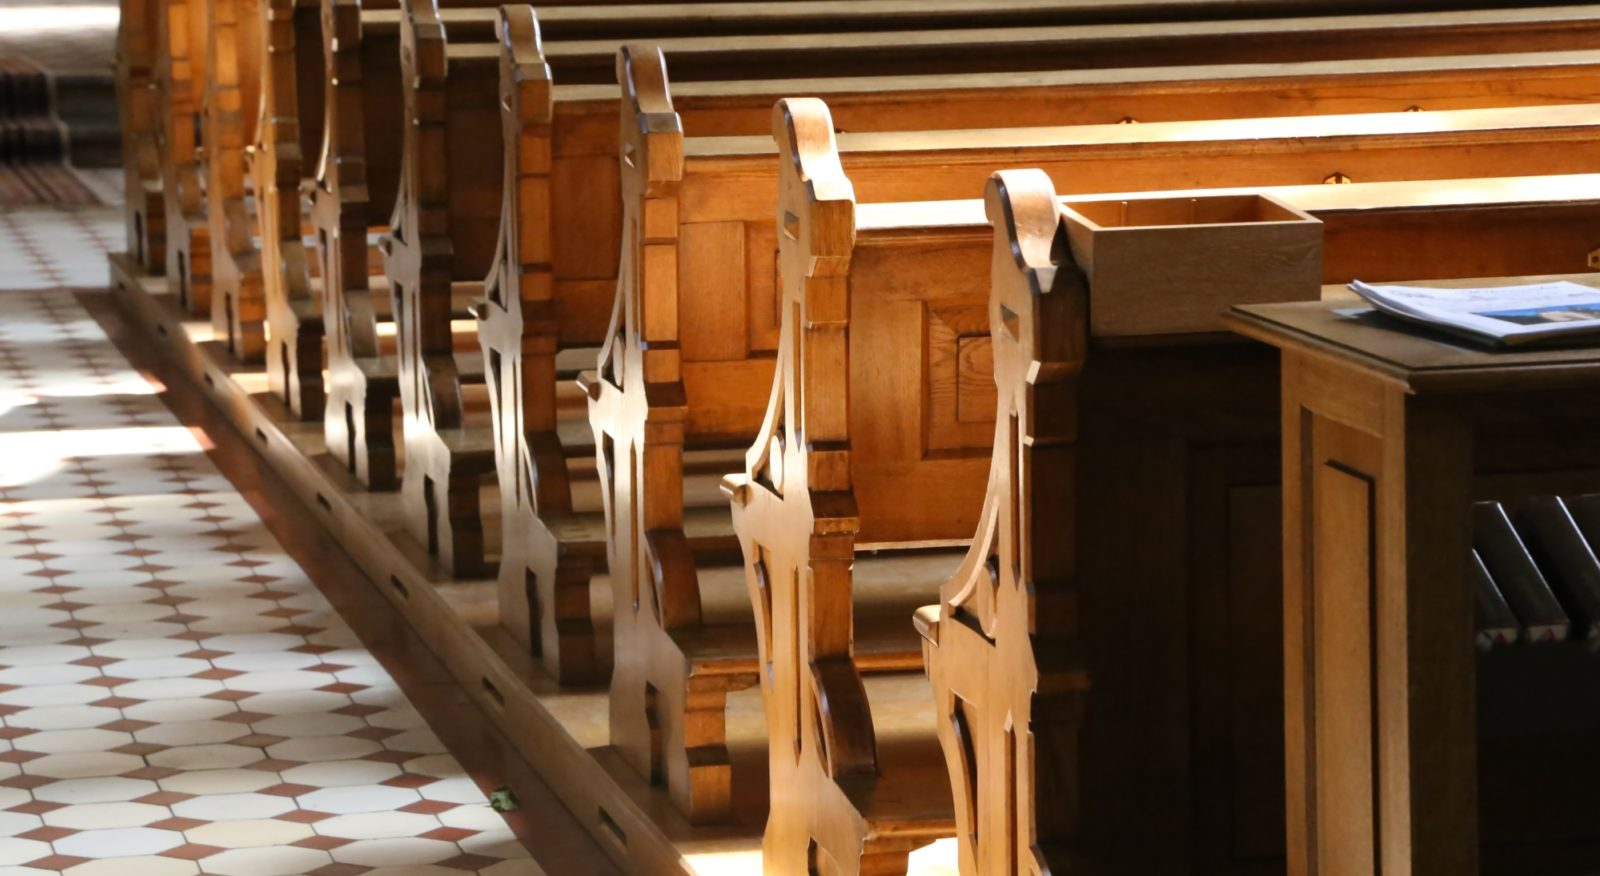 Church Pews Cropped